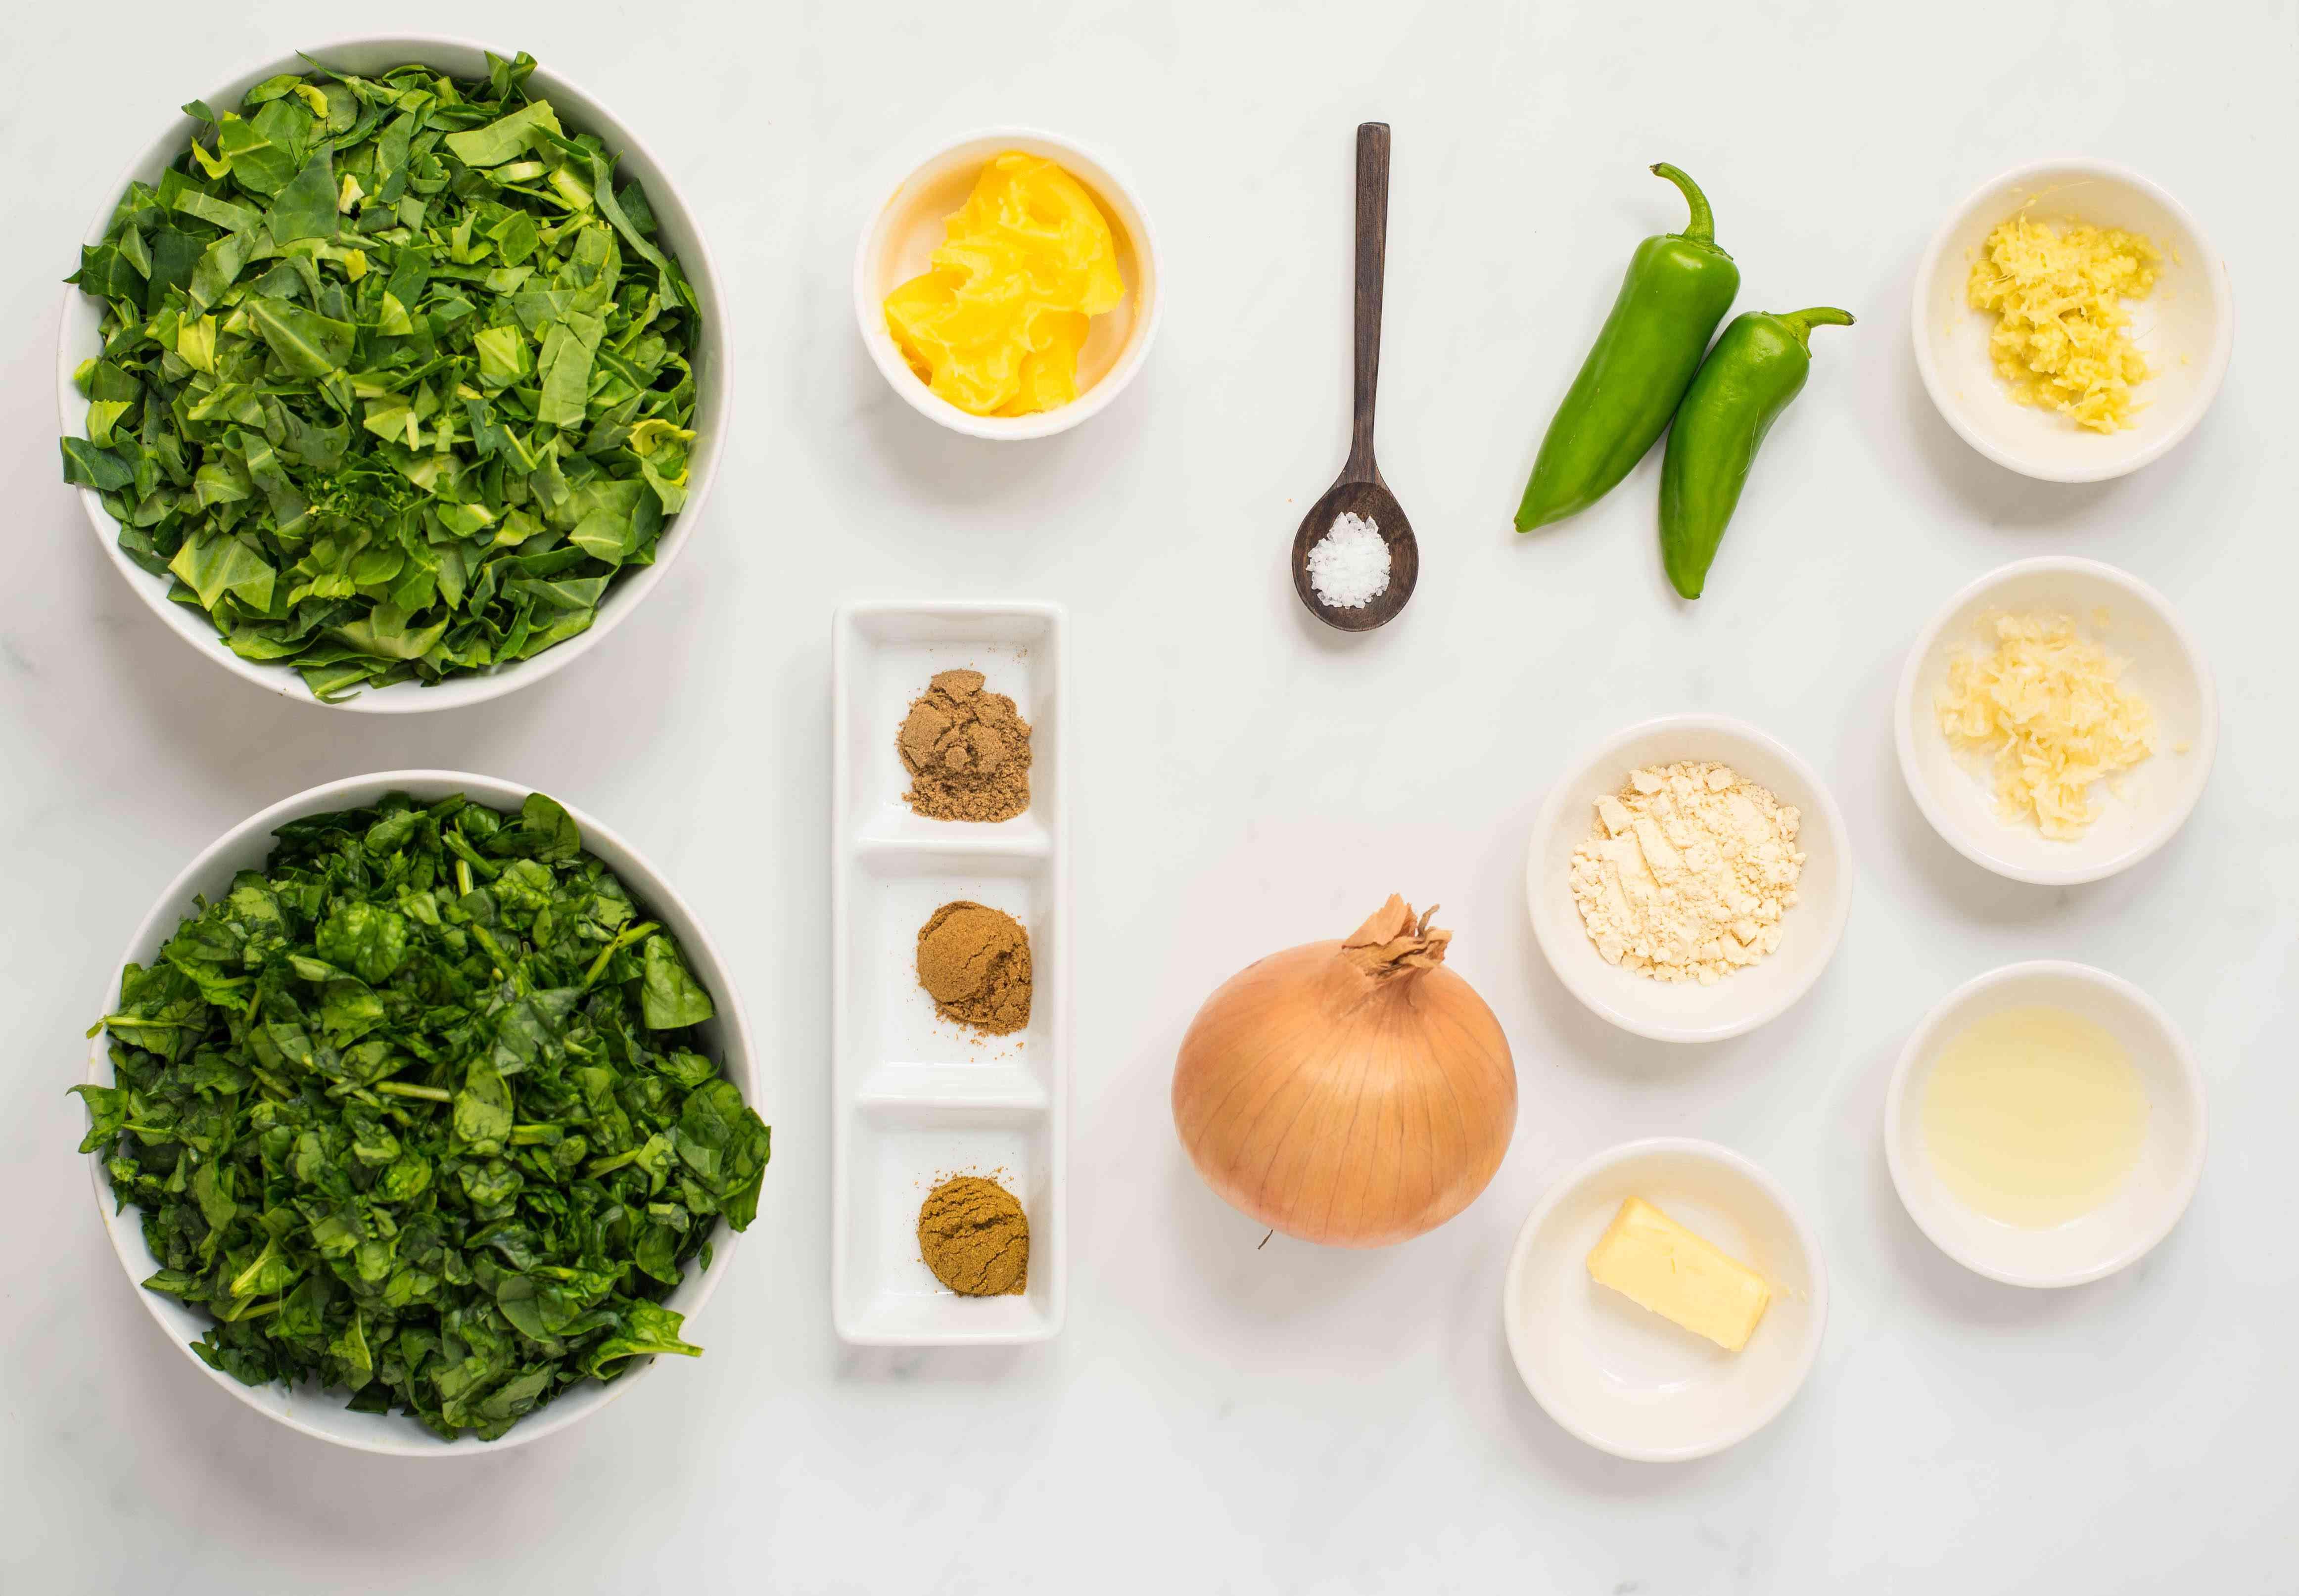 Ingredients for sarson ka saag